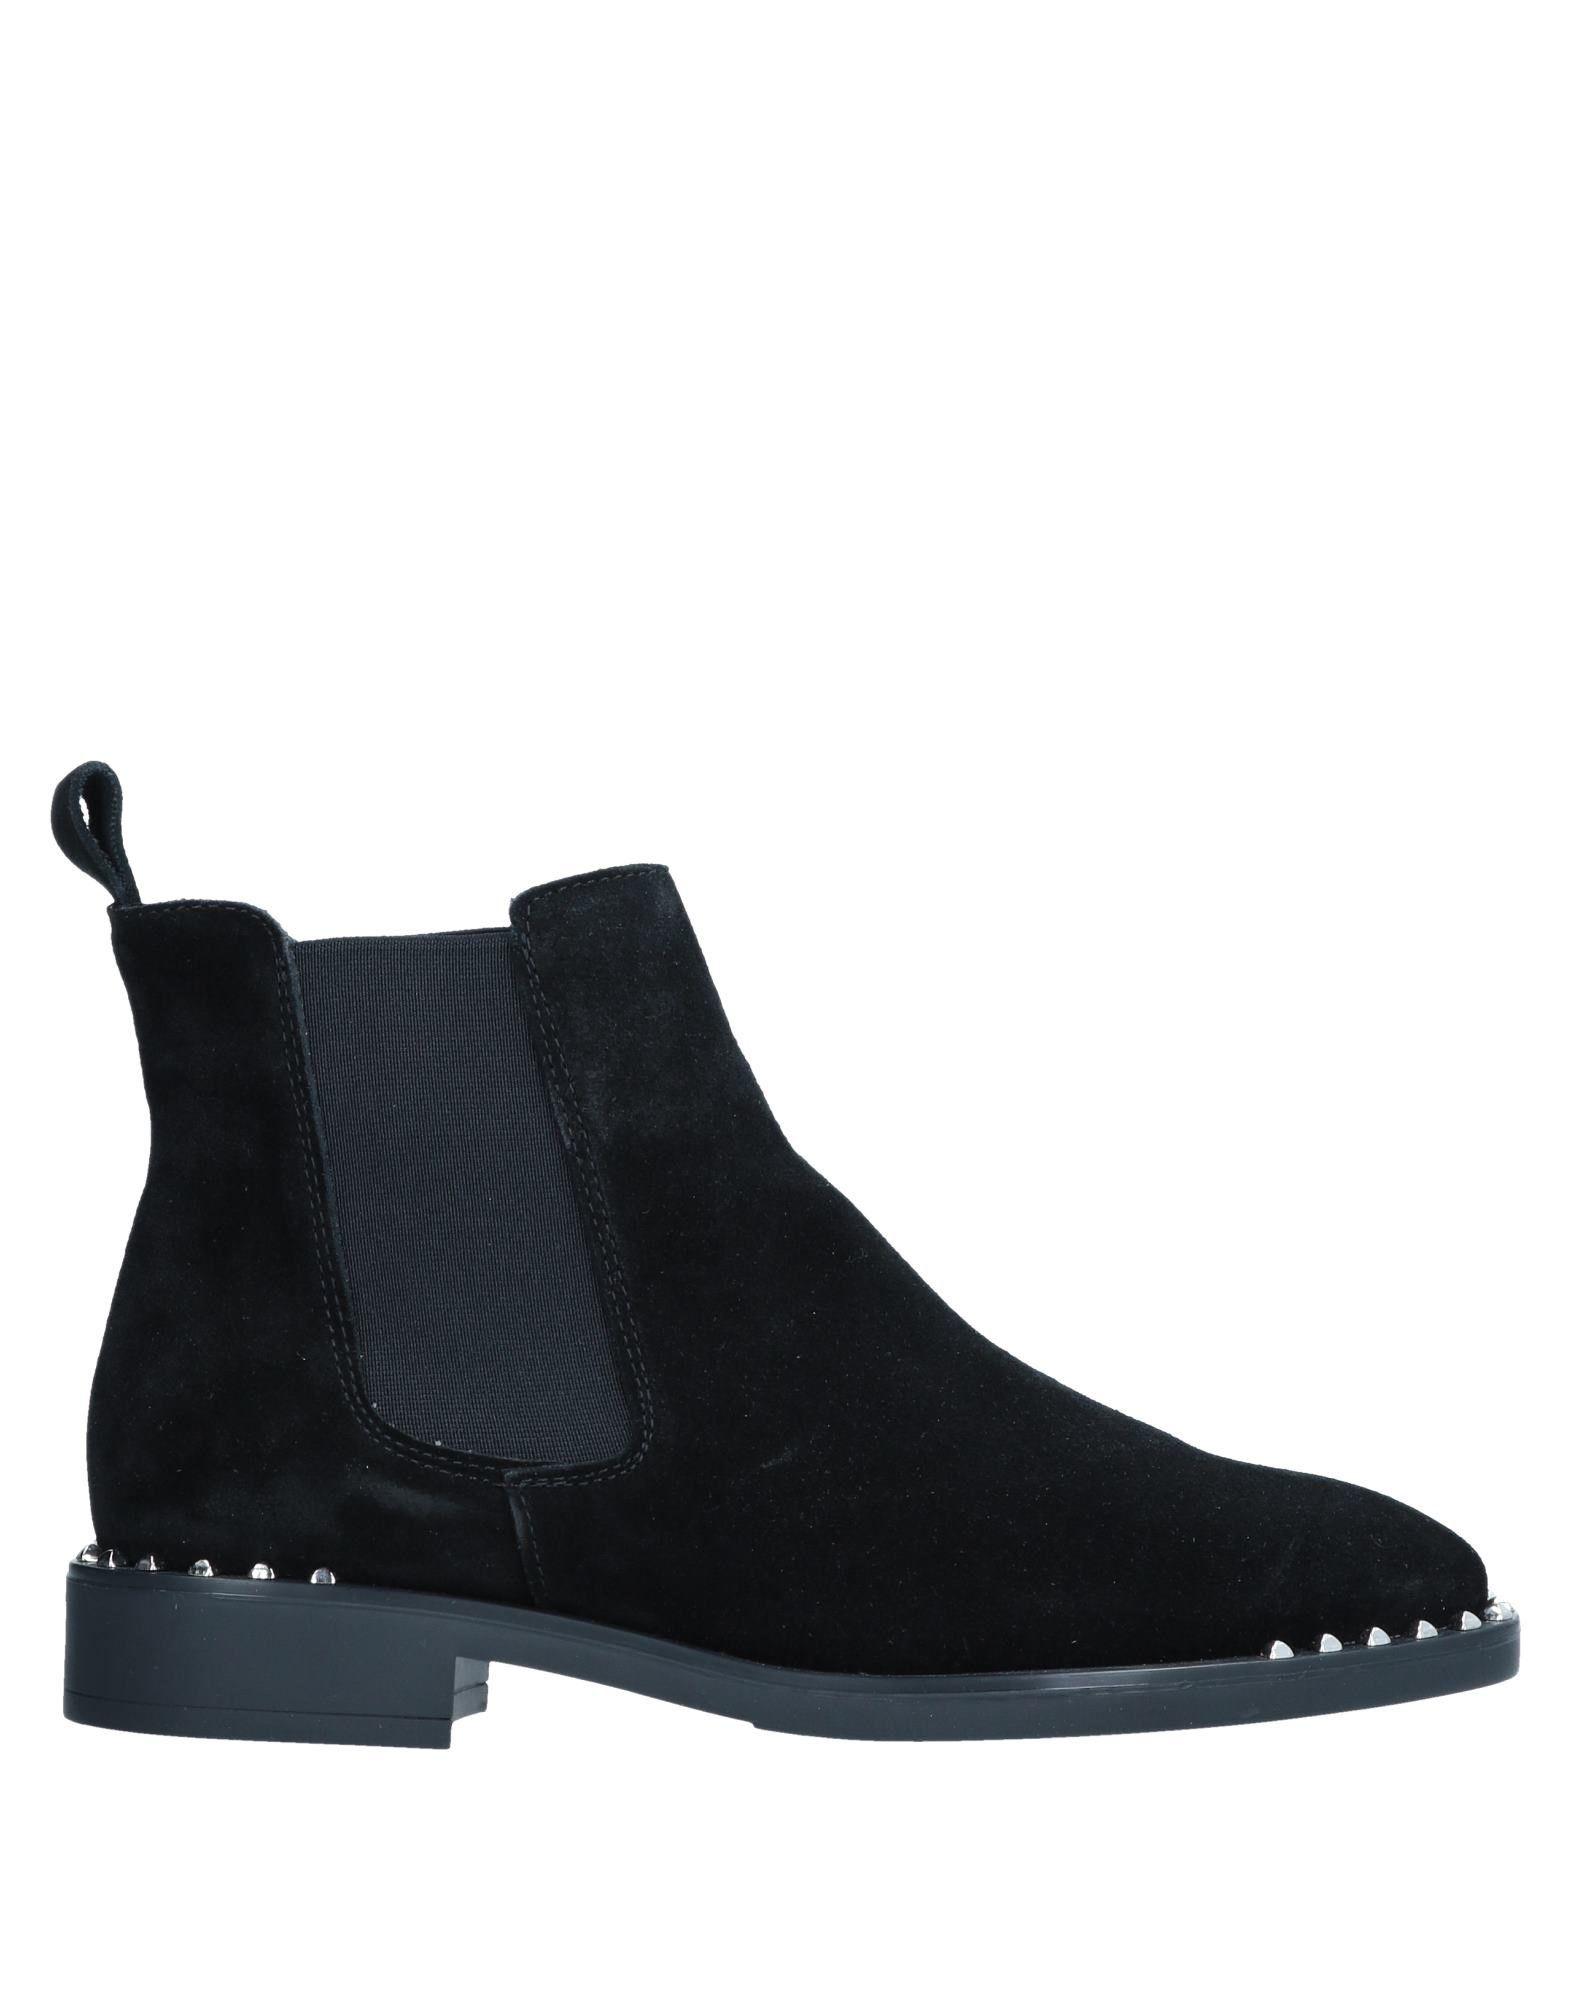 ALPE WOMAN SHOES Полусапоги и высокие ботинки rivets shoes pointed toe woman thin high heels sexy stylish 12cm black lady patent leather shoes wedding shoes pumps 2018 newest